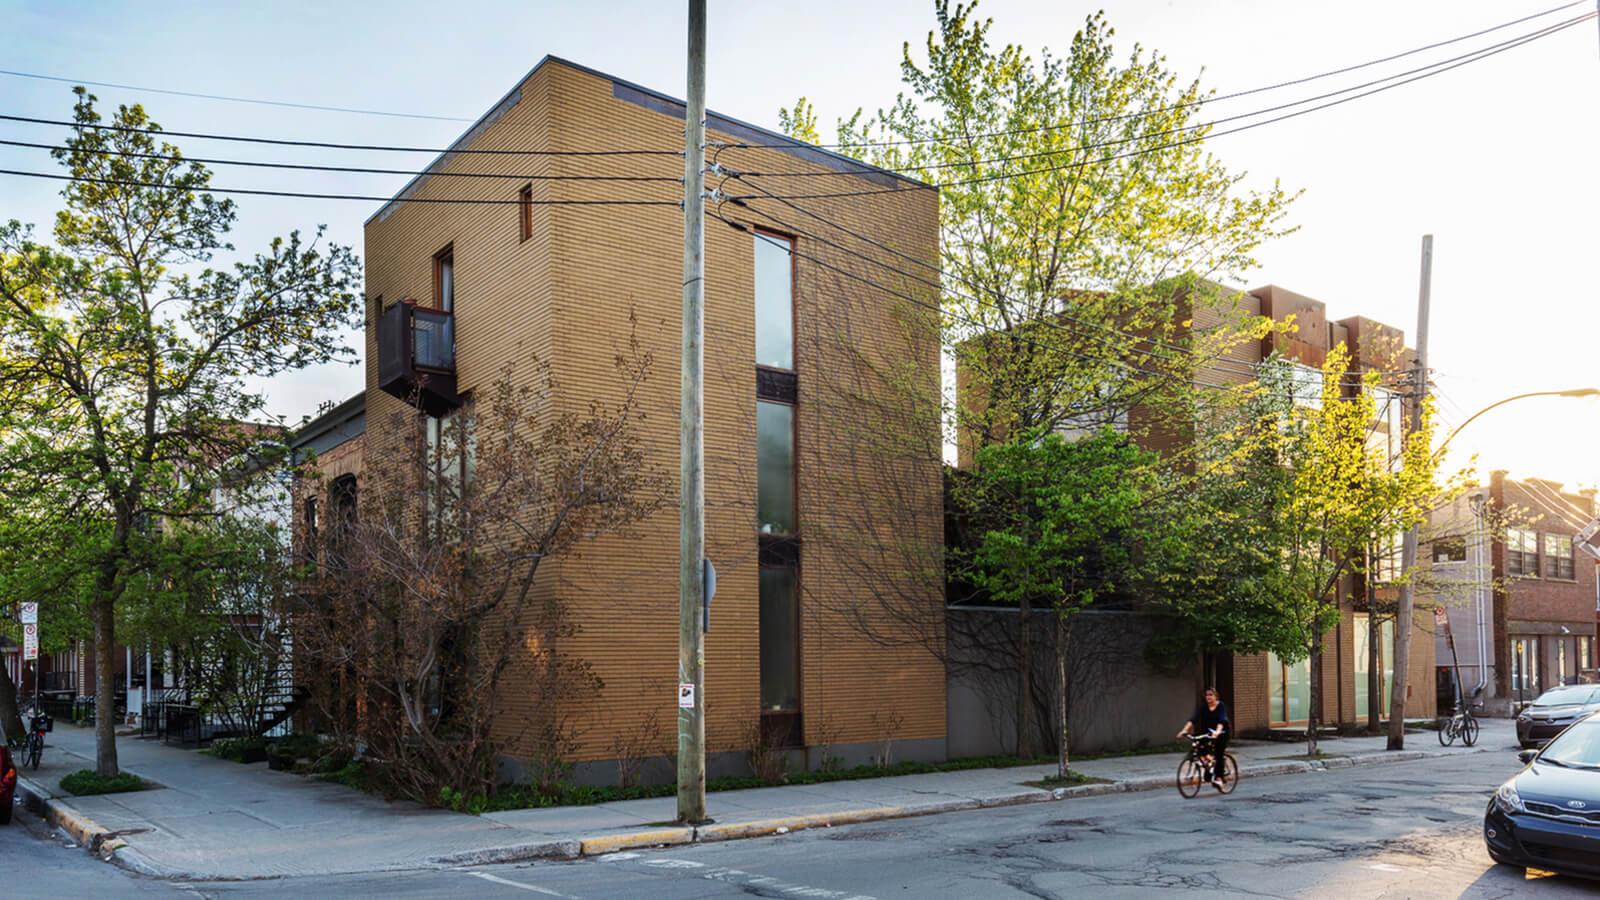 yh2, Maison Atelier, Montreal